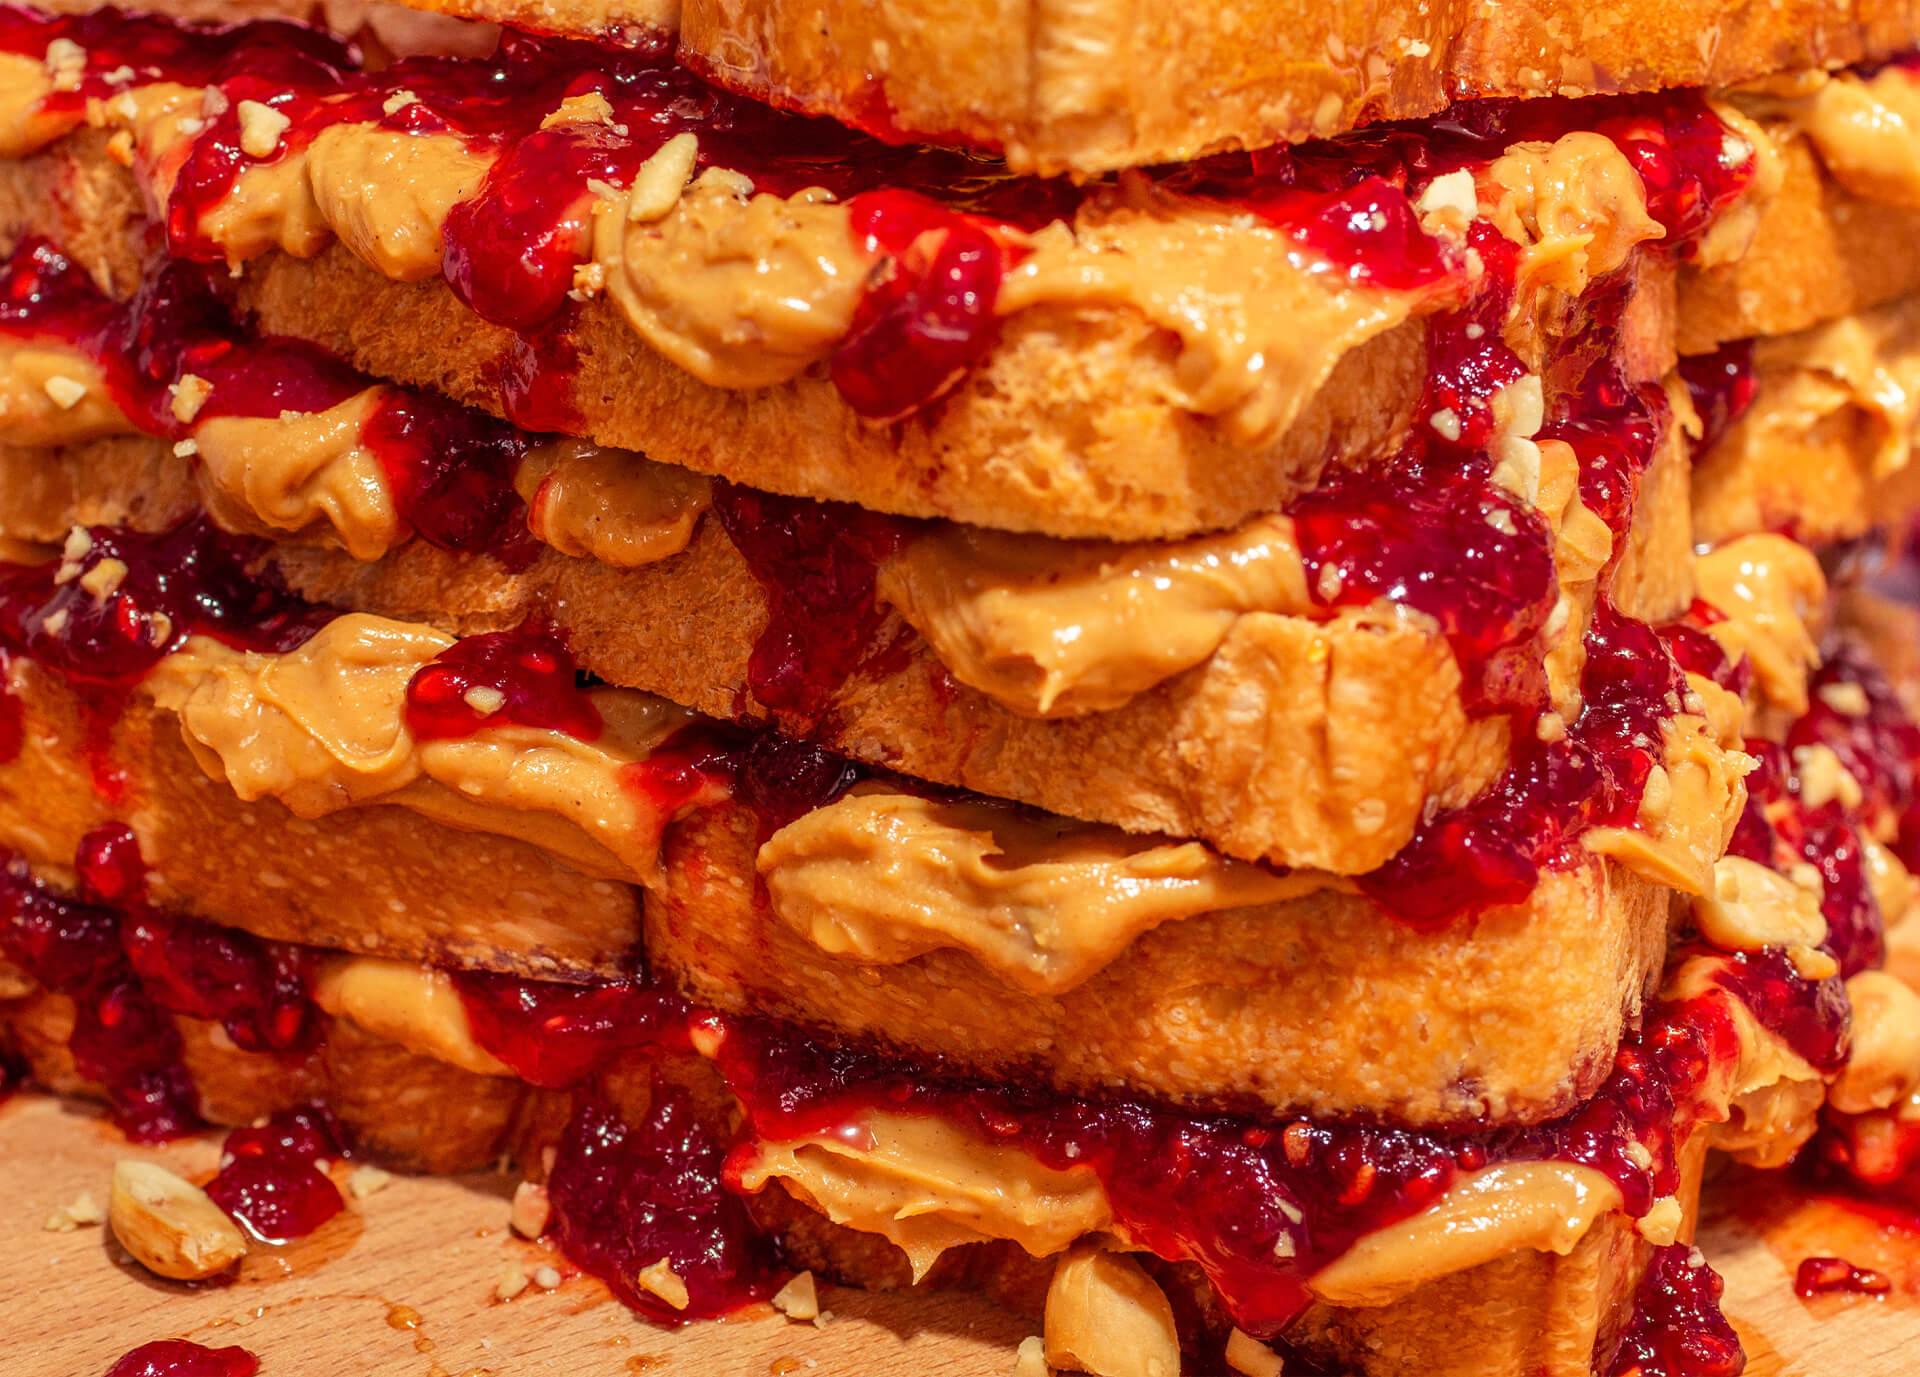 Peanut Butter Jelly close up shot